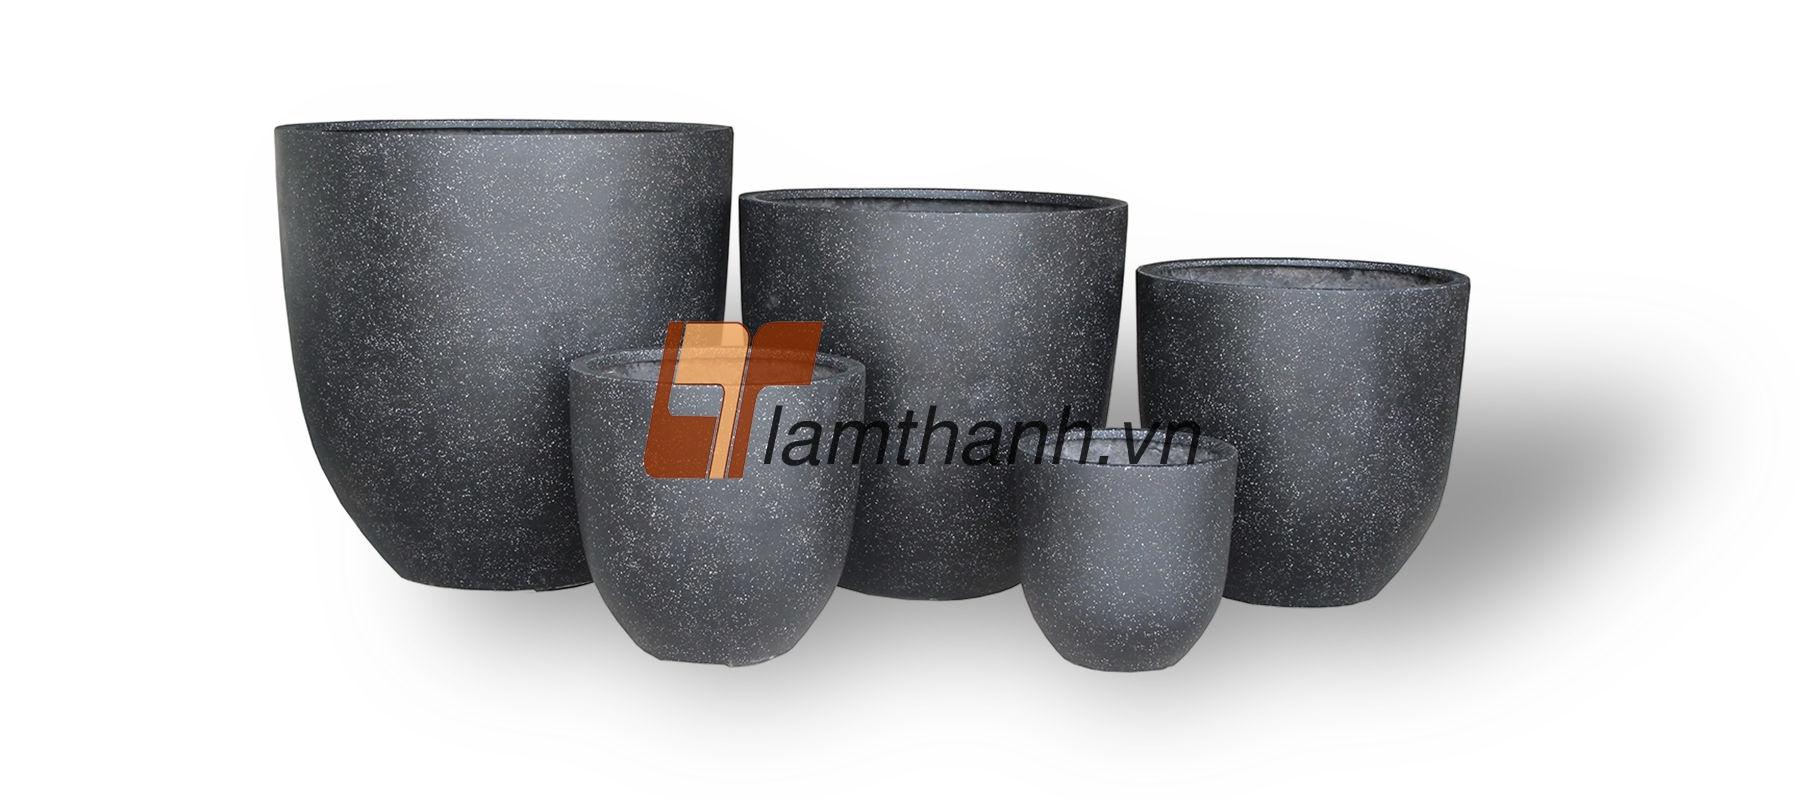 vietnam polyresin, fiberstone 06